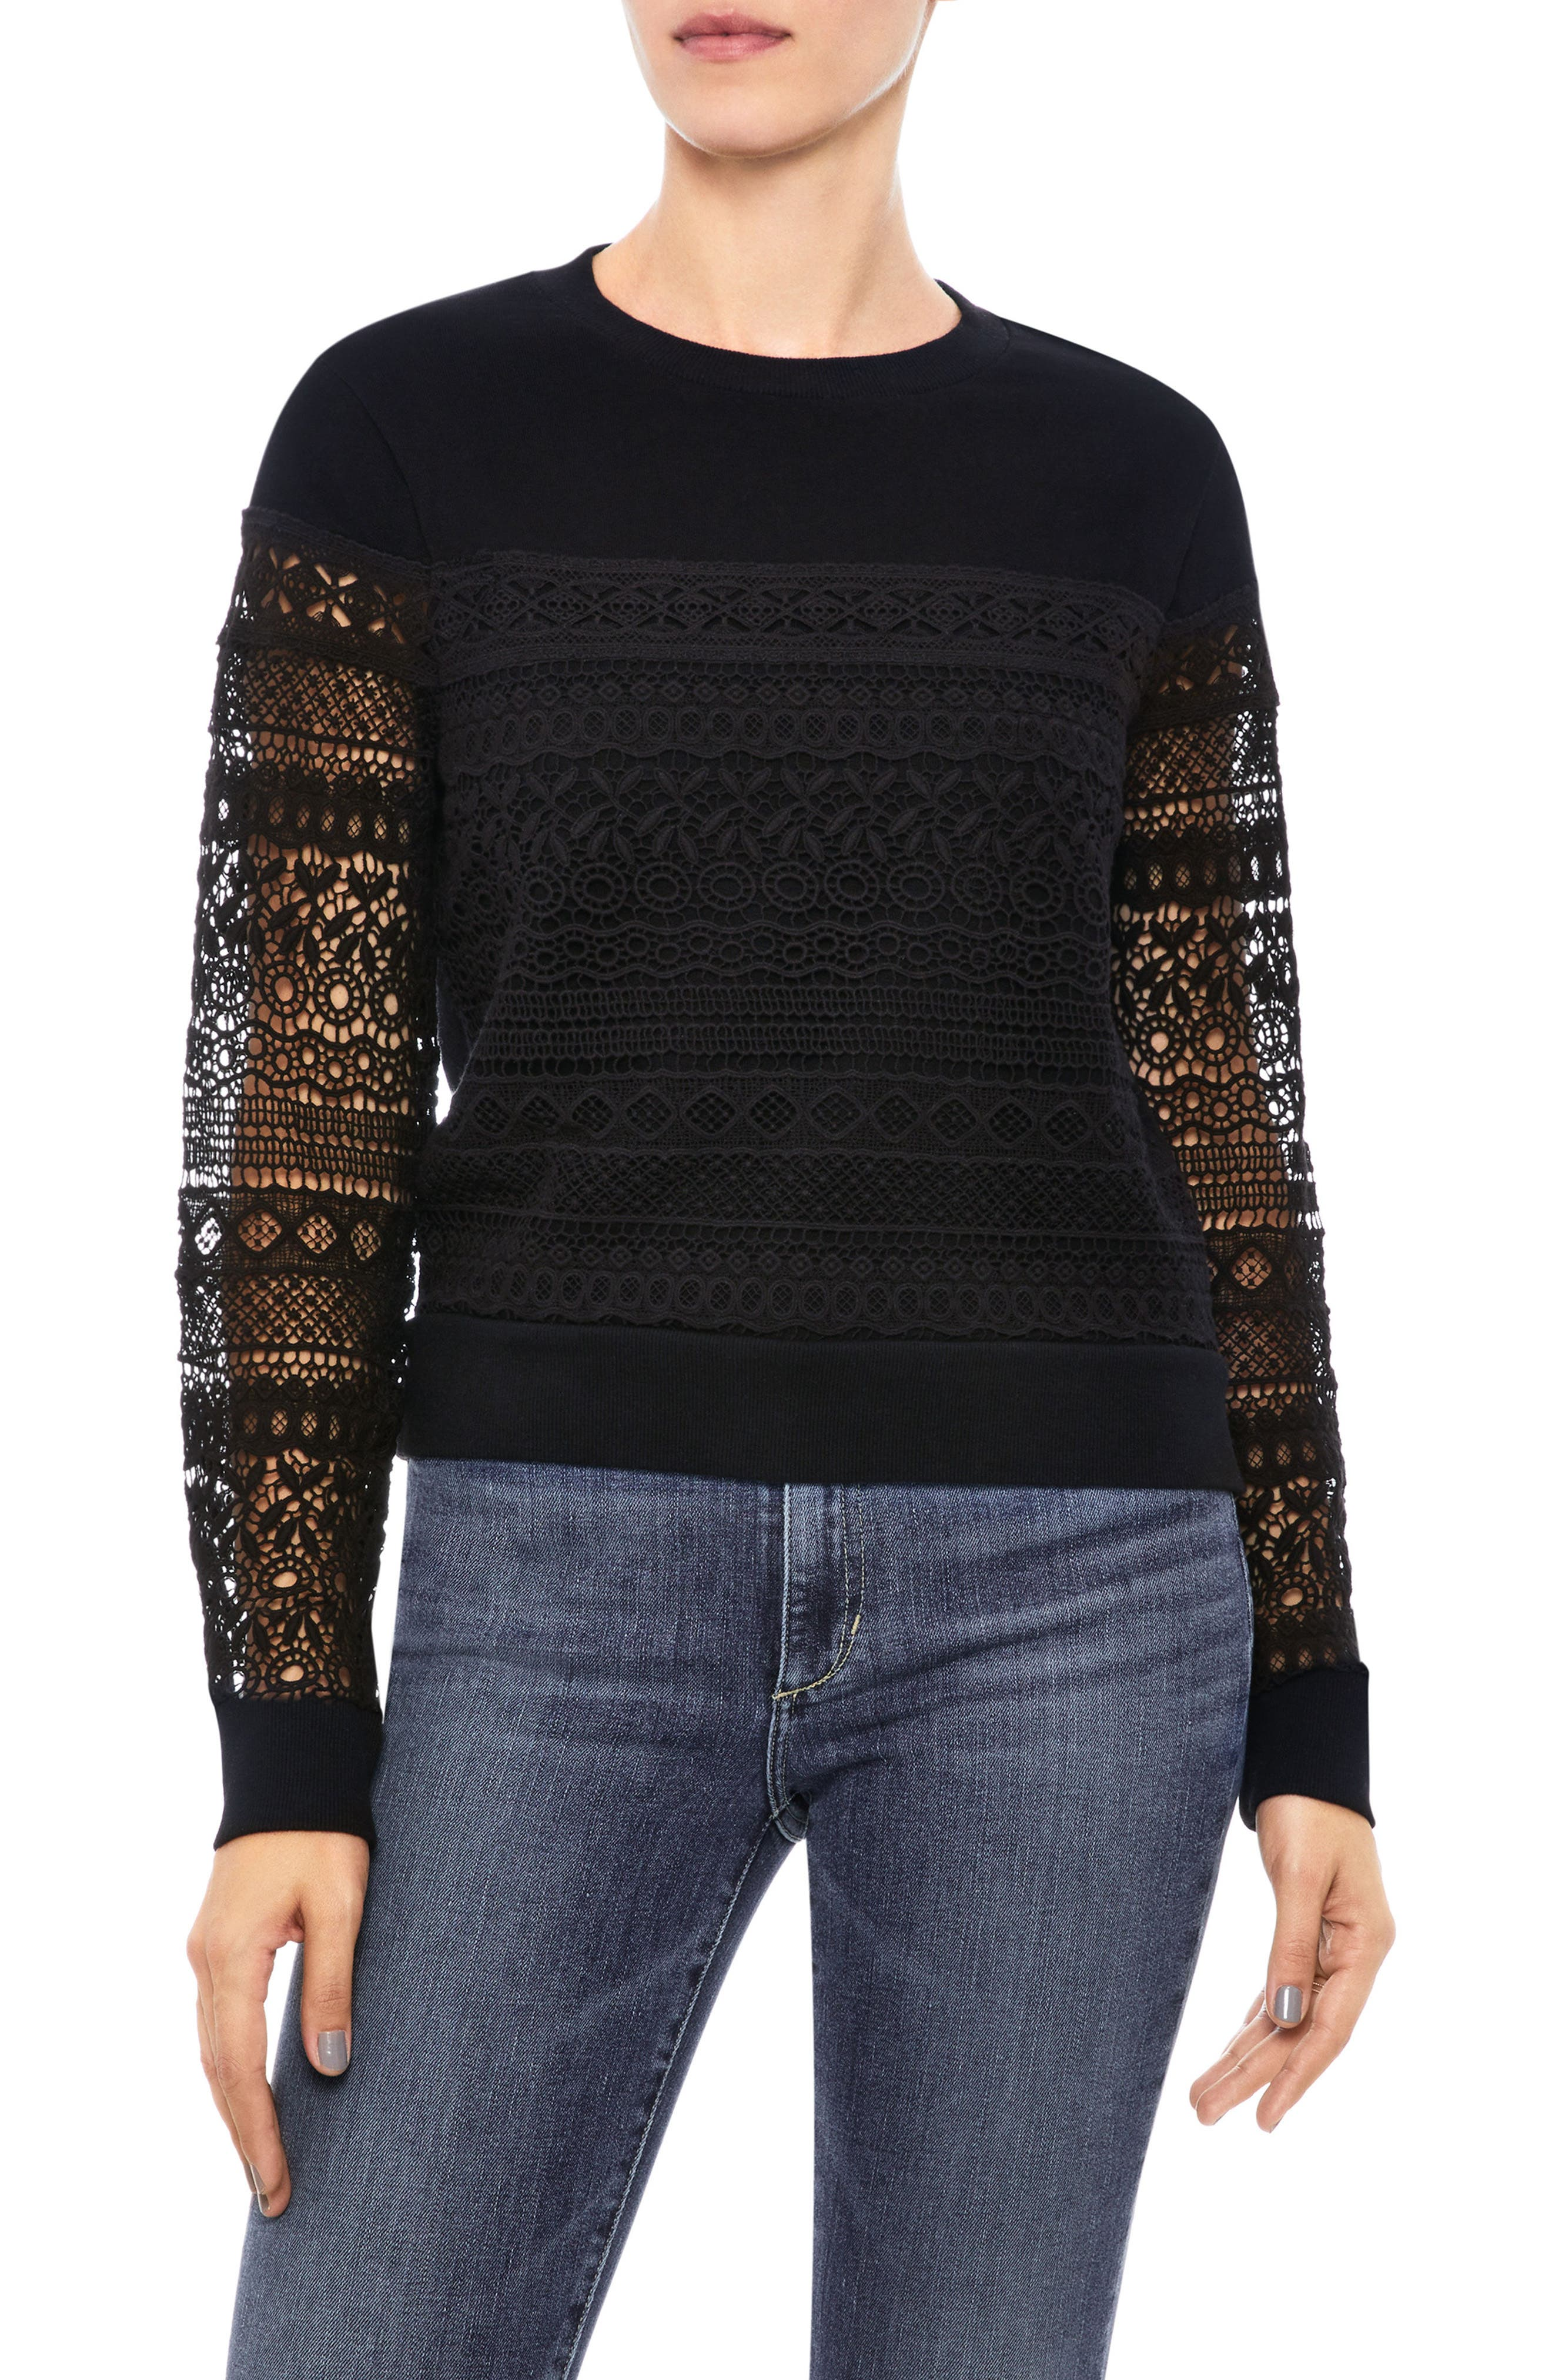 Martina Sweatshirt,                         Main,                         color, BLACK